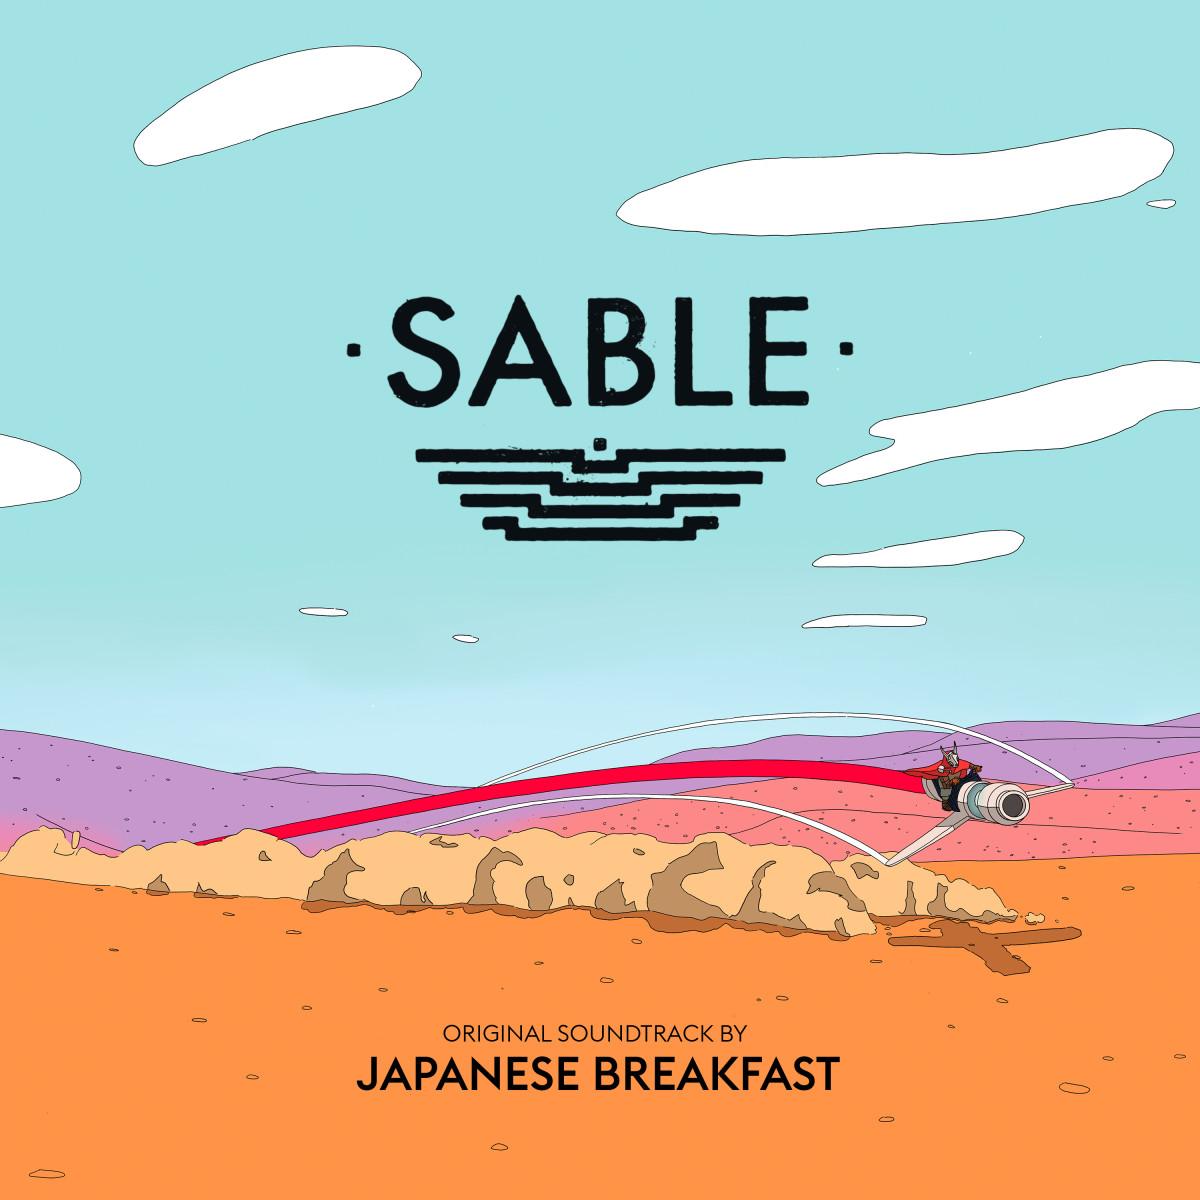 Japanese Breakfast Sable Video Game Soundtrack Cover Art